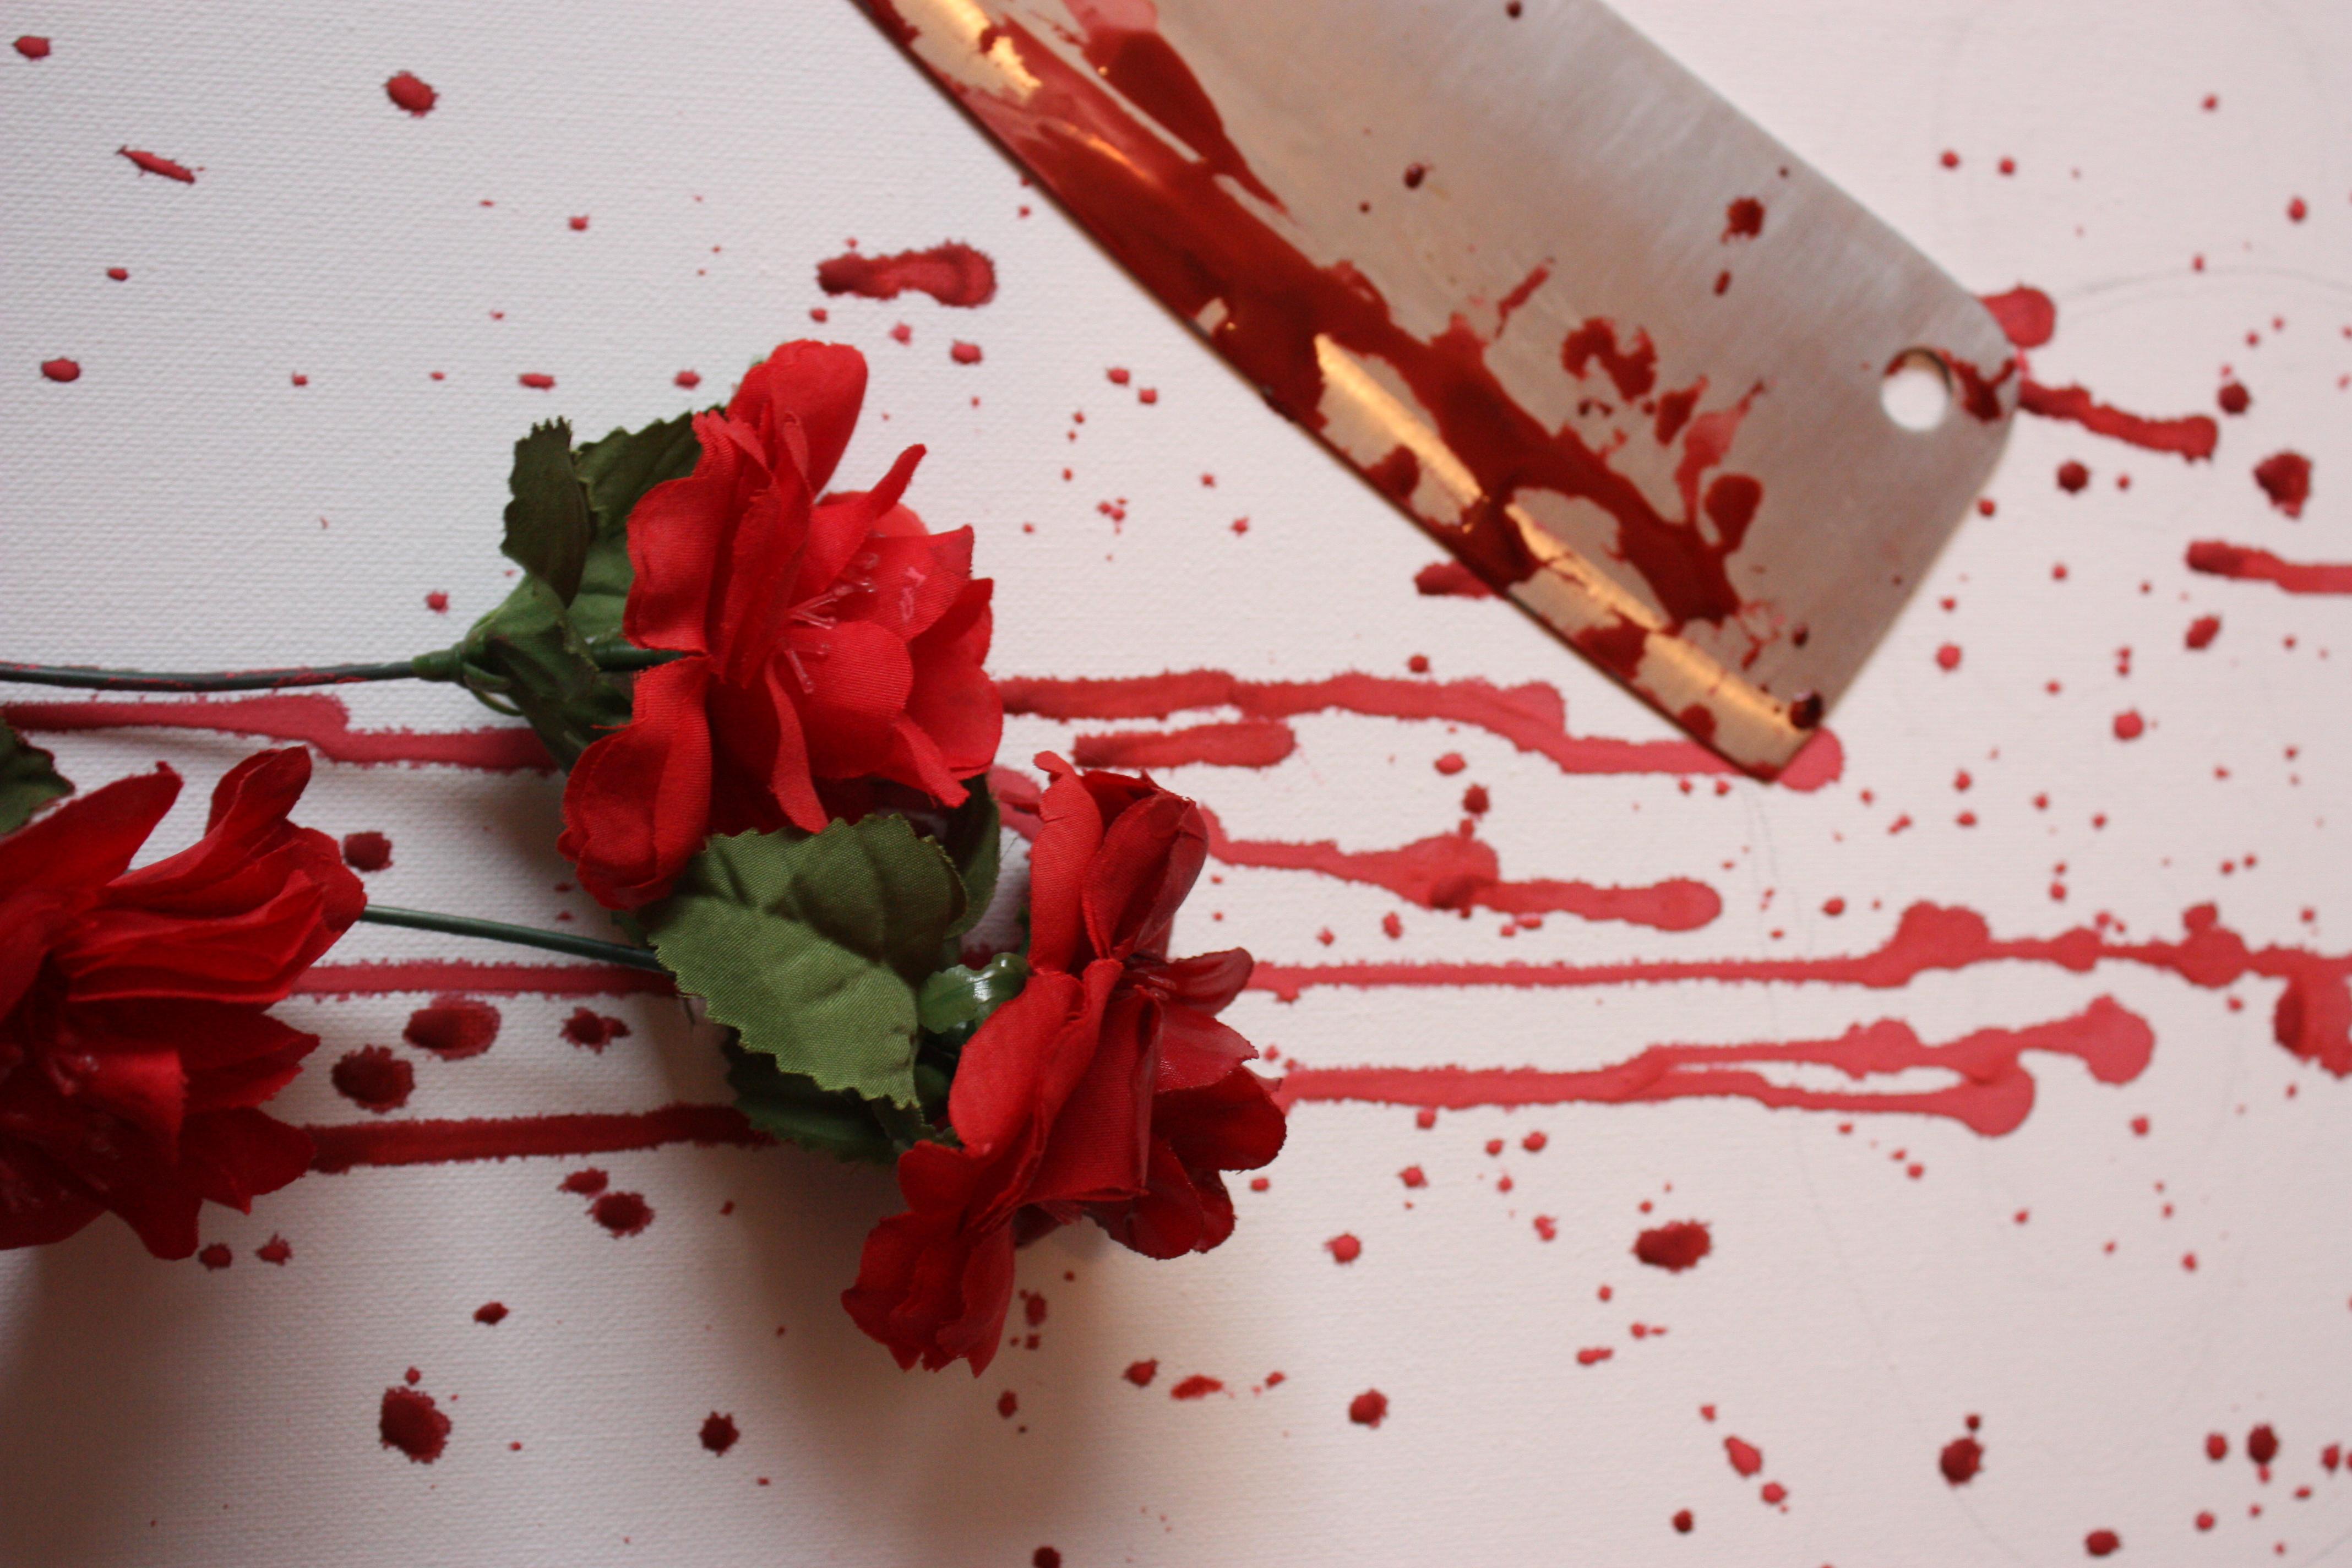 Rose Pic.jpg